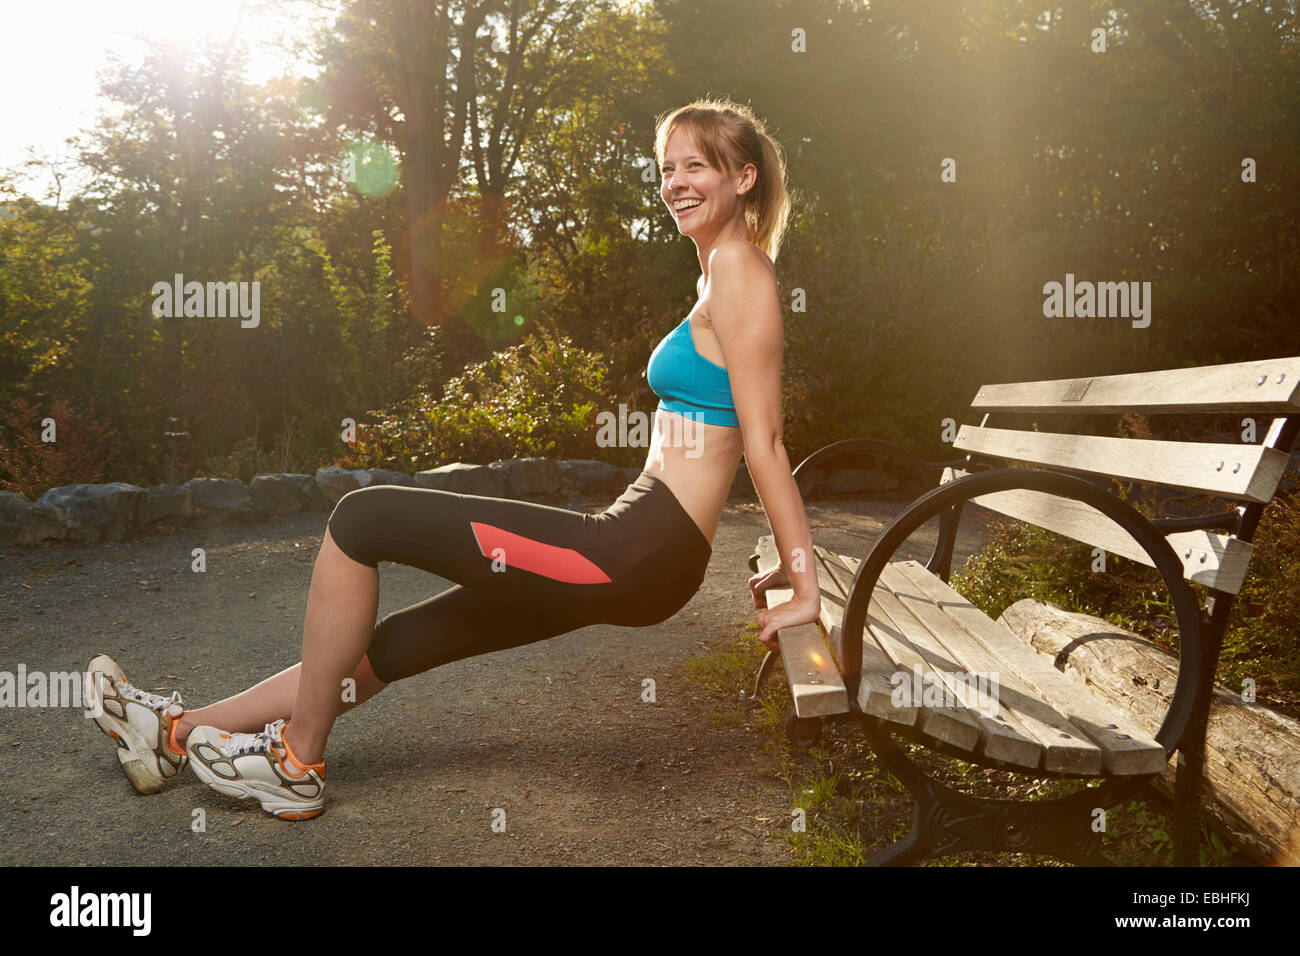 Female runner stretching against park bench - Stock Image